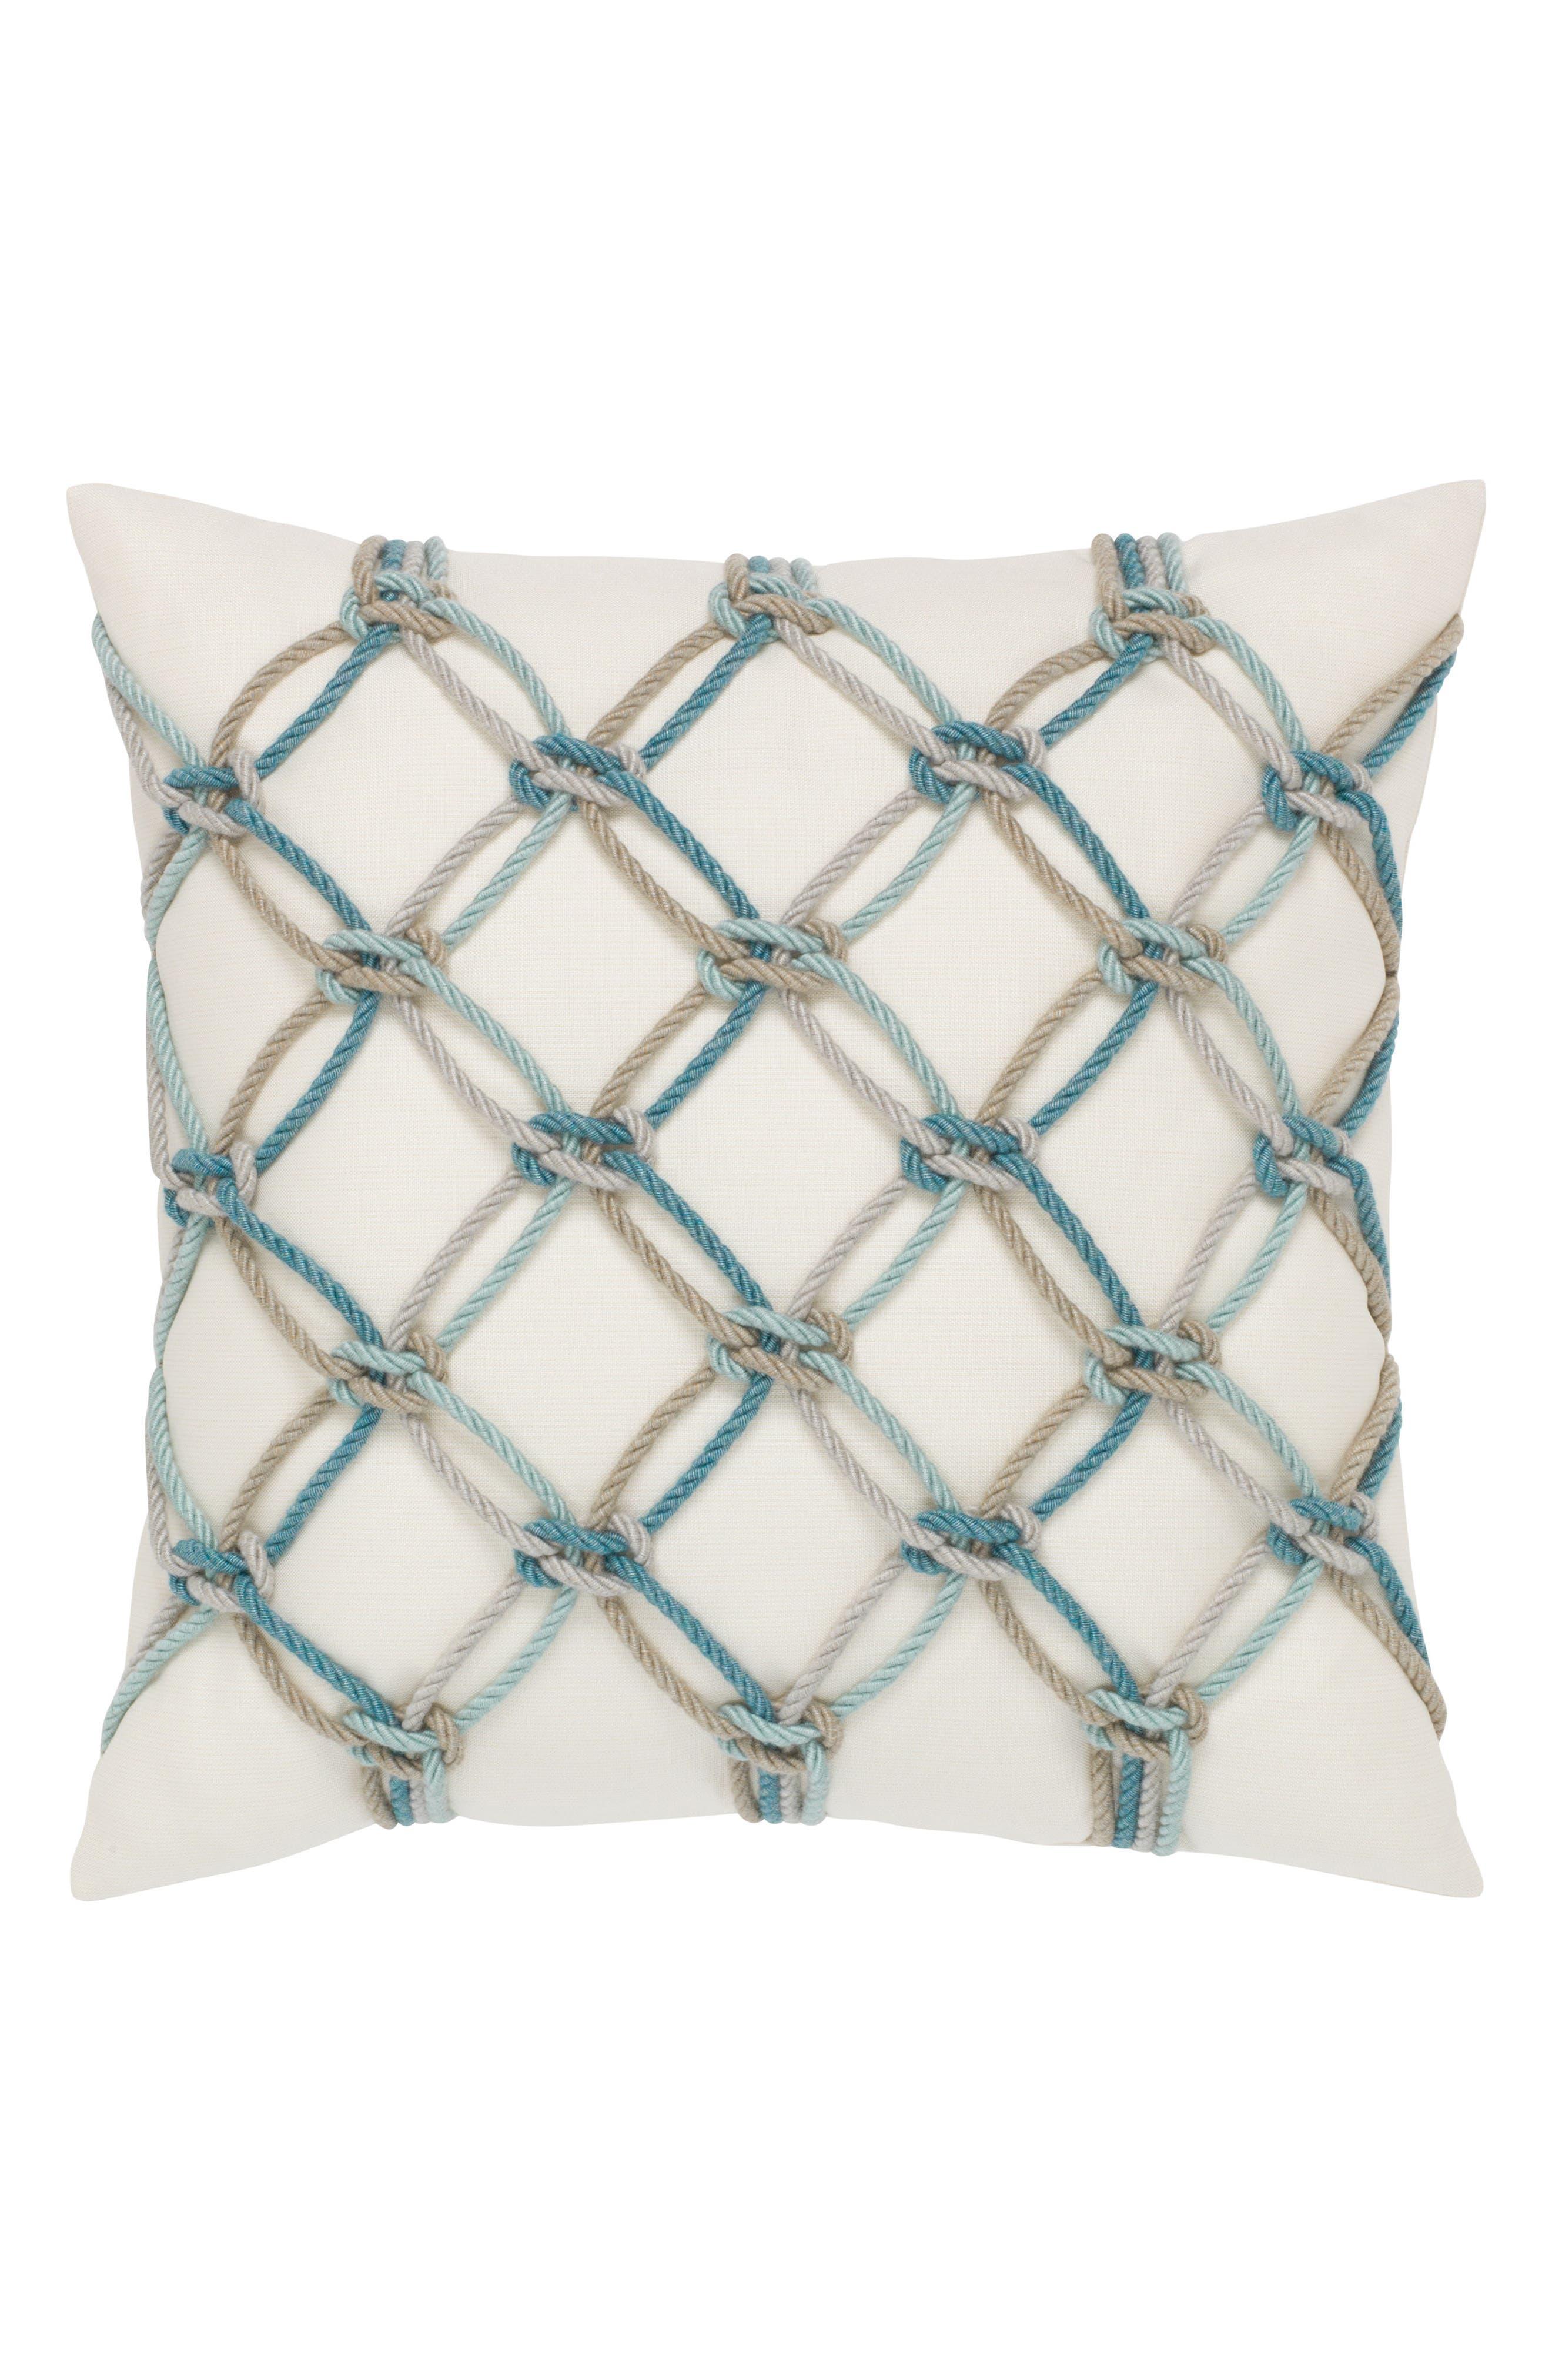 Aqua Rope Indoor/Outdoor Accent Pillow,                         Main,                         color, WHITE/ BLUE